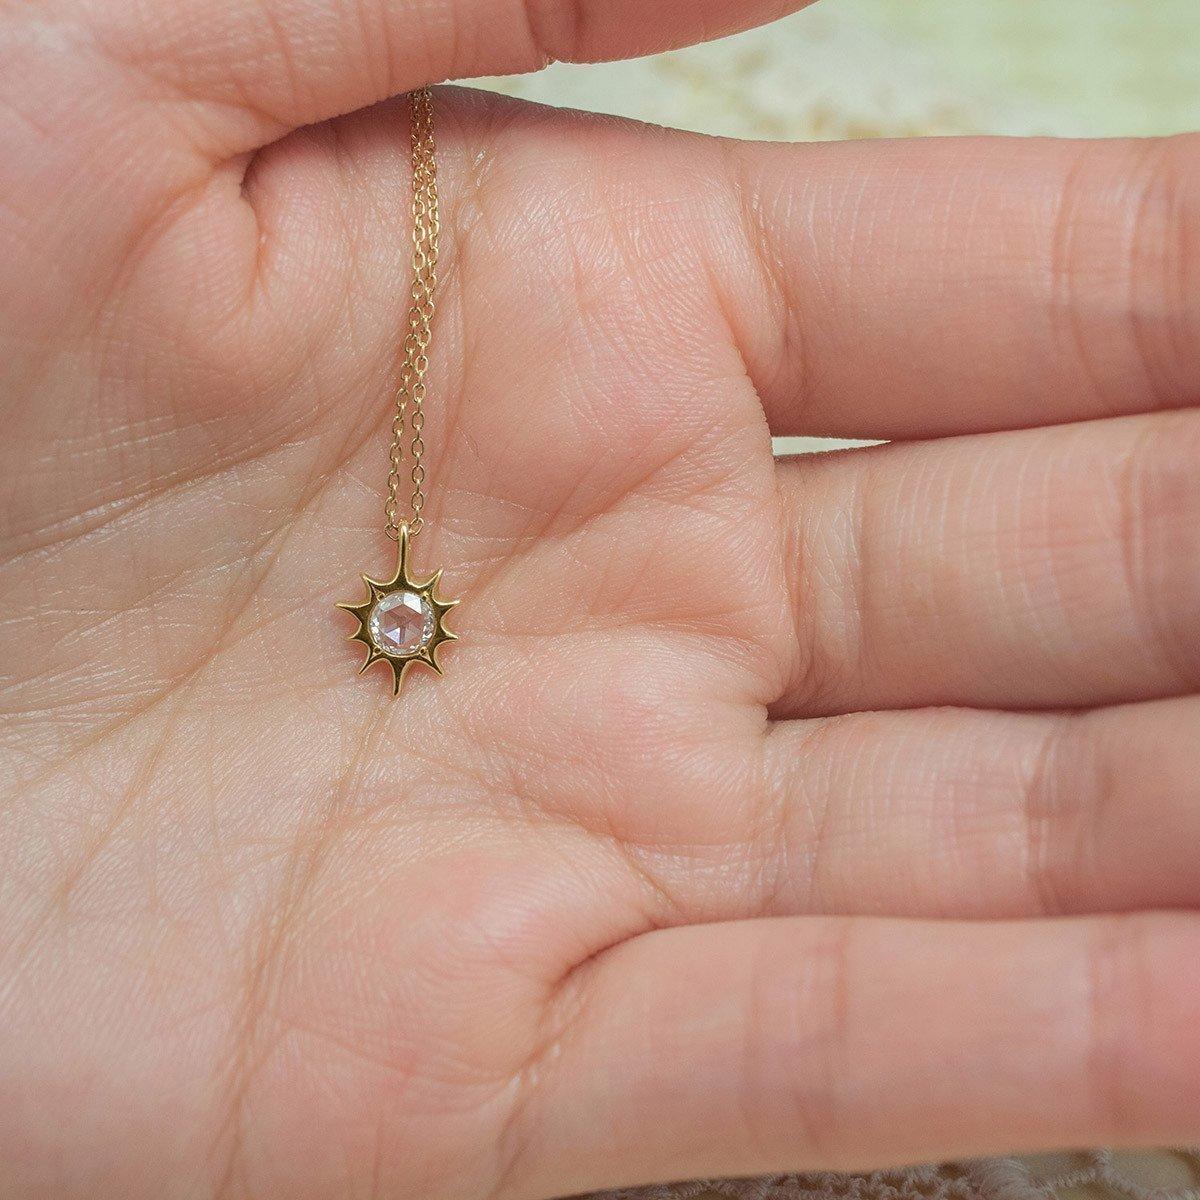 Lani Golden Sun with a Rose Cut Diamond - ileava jewelry